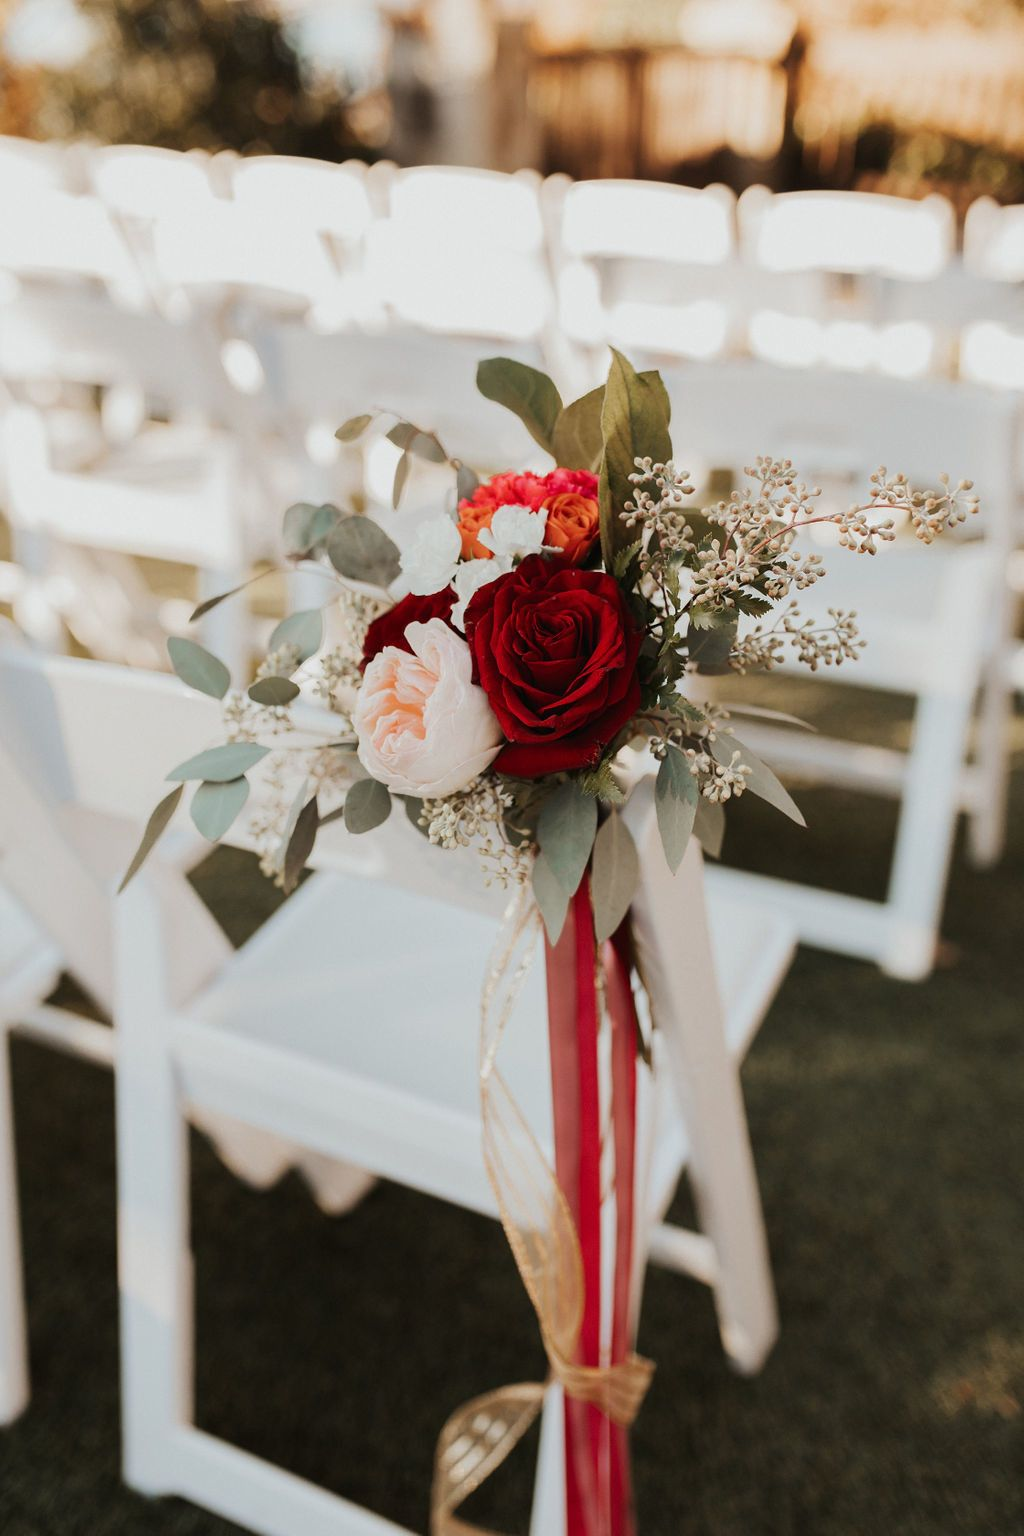 Wedding Venue Tulsa Oklahoma Wedding Ceremony Decorations